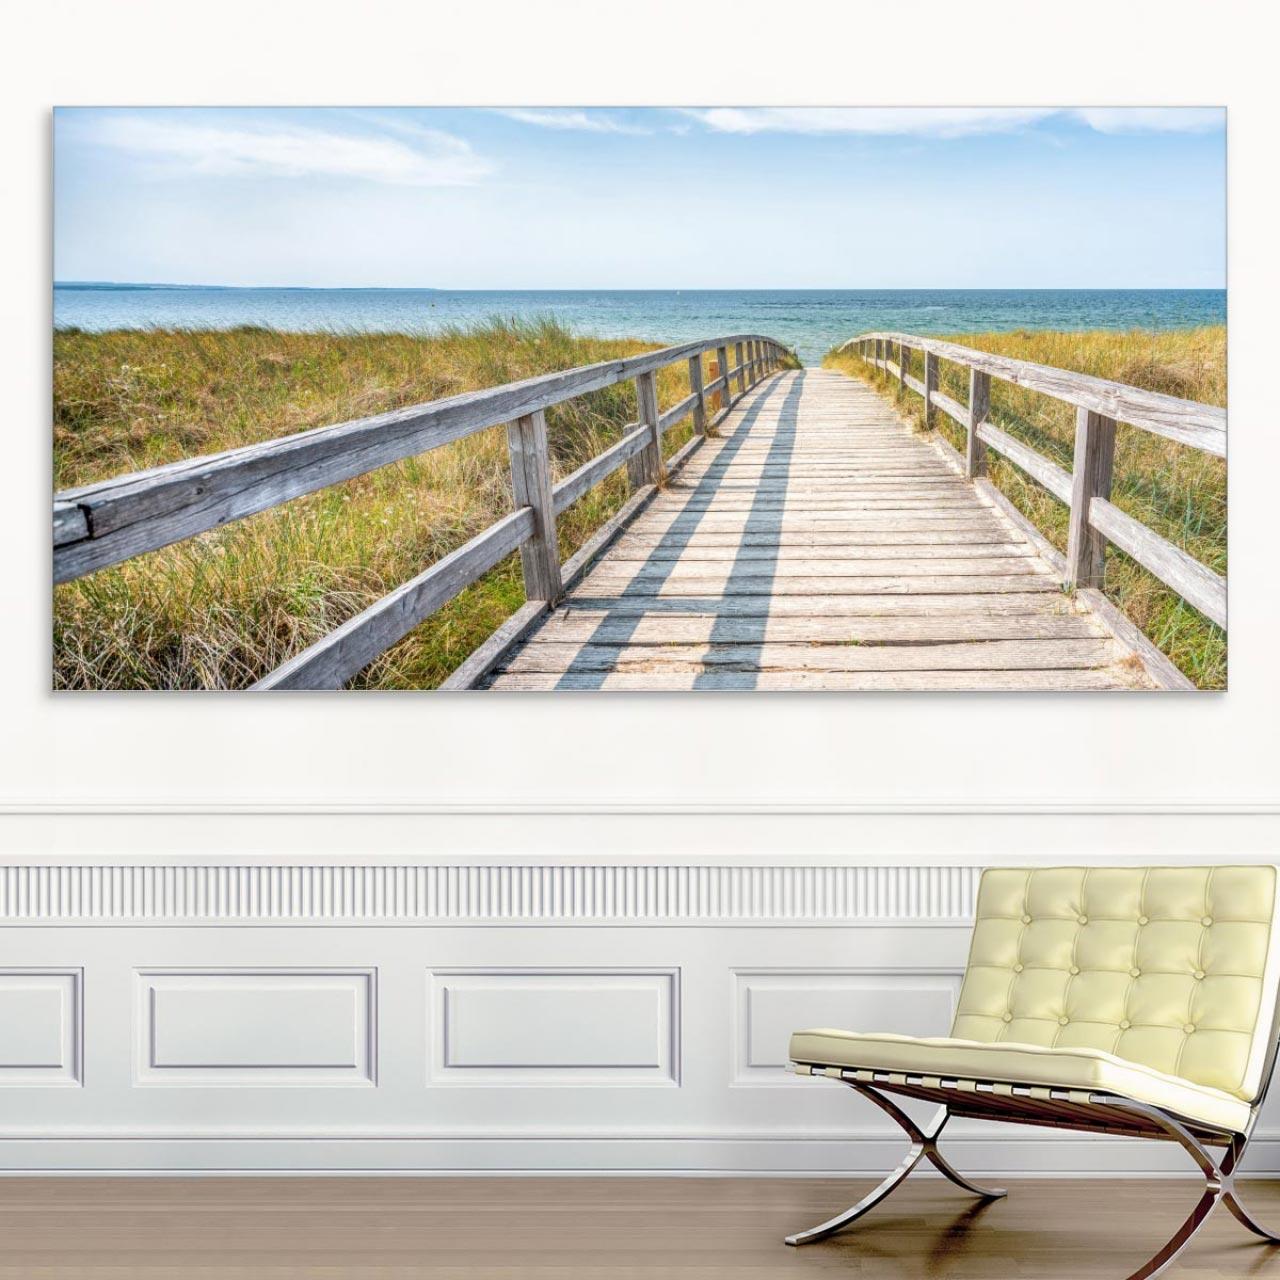 Akustikbild Strand mit Dünenübergang Lounge, einseitig, Wandmontage